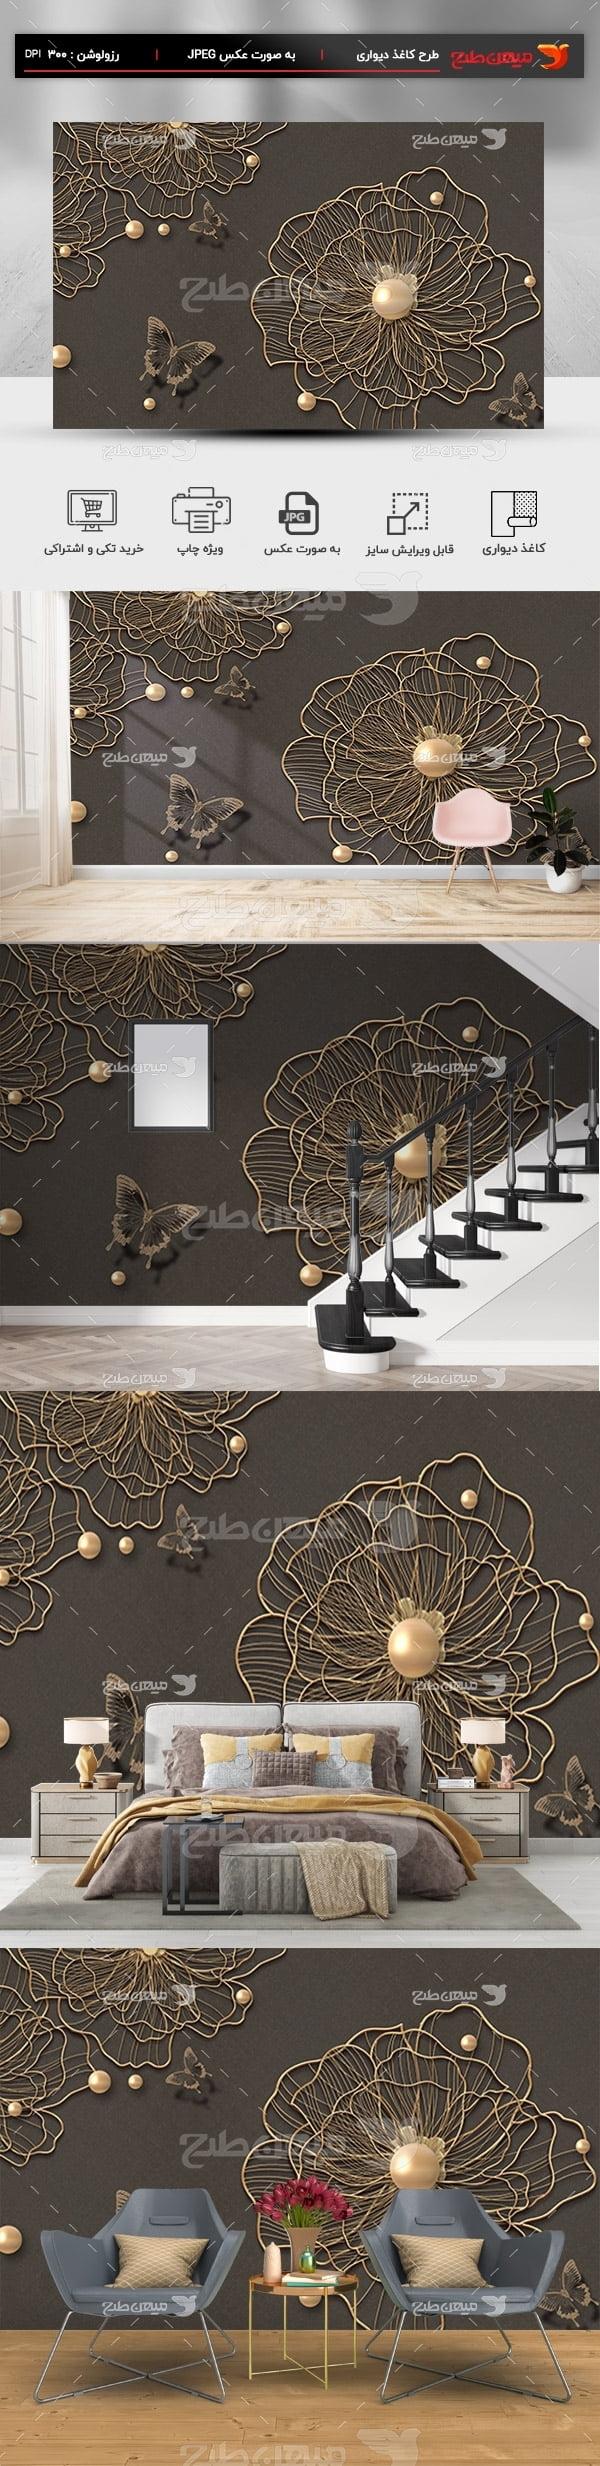 پوستر کاغذ دیواری سه بعدی قهوه ای با طرح گل طلایی